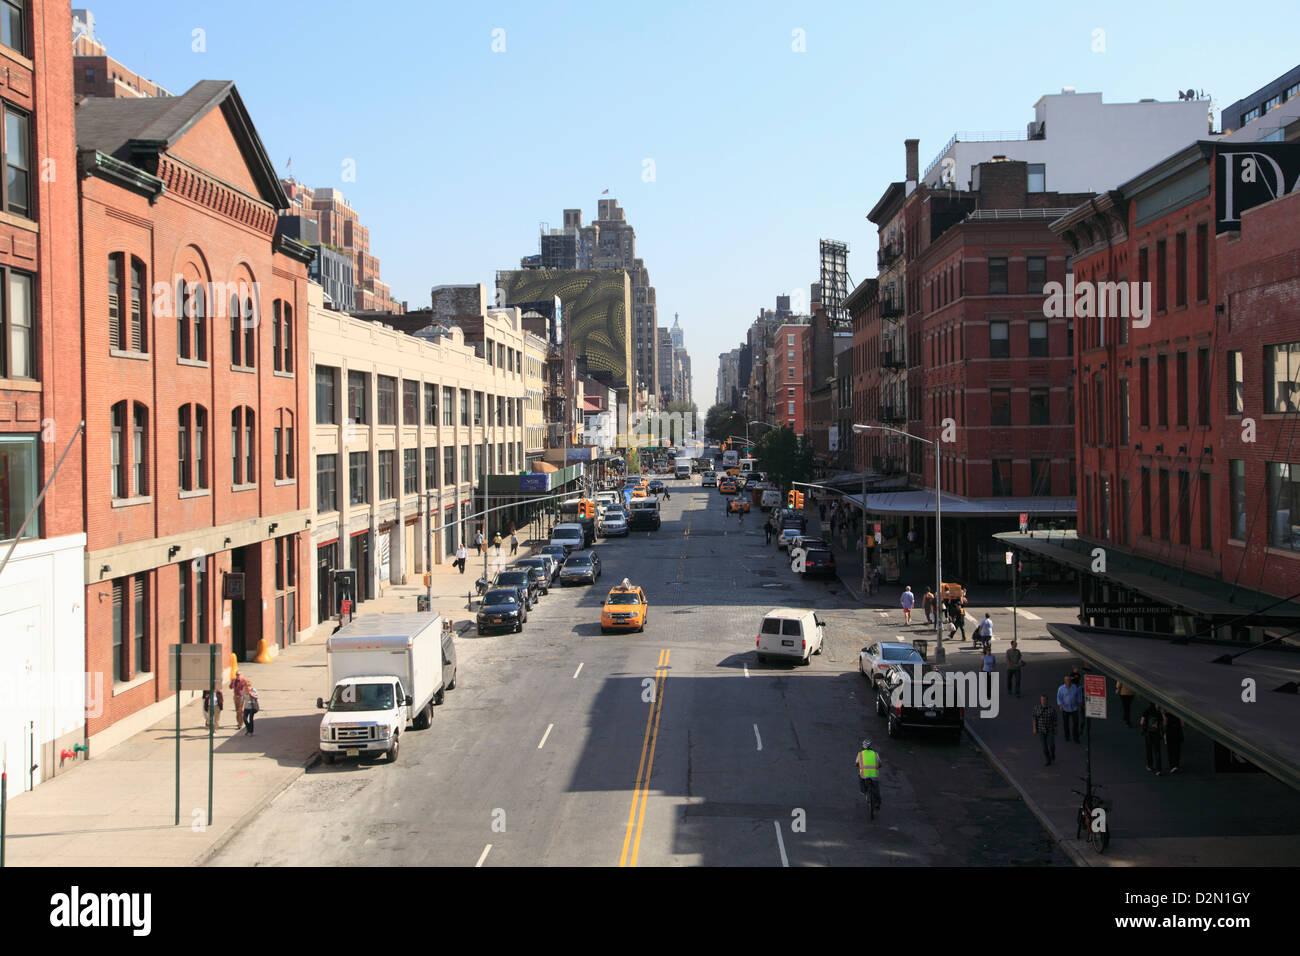 14th Street, Meatpacking District, downtown Szeneviertel, Manhattan, New York City, USA Stockbild